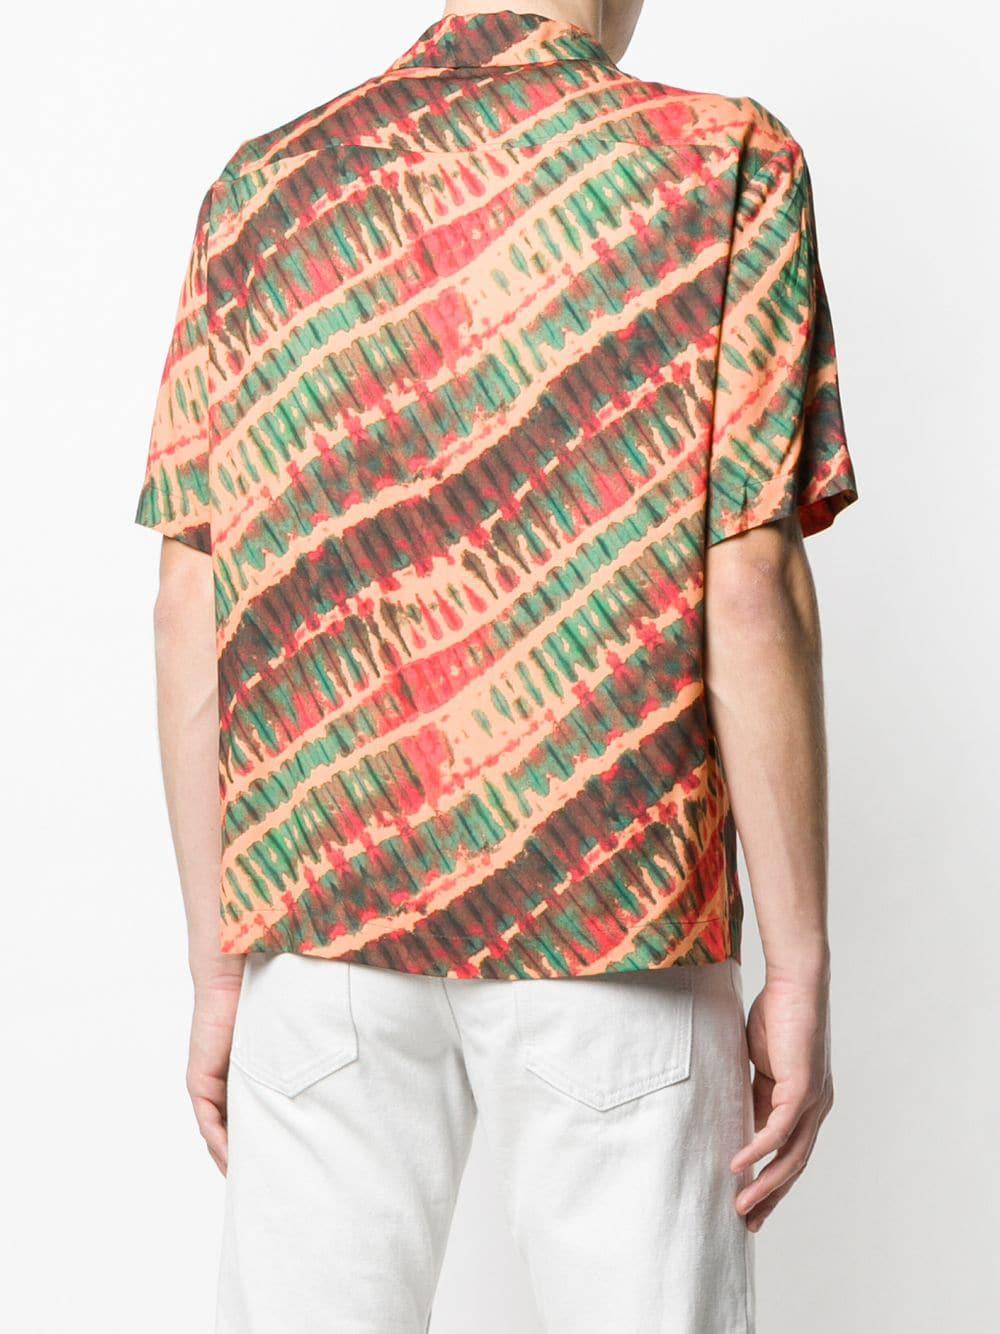 Missoni - Orange Tie-dye Short Sleeve Shirt for Men - Lyst. View fullscreen de89f69ef